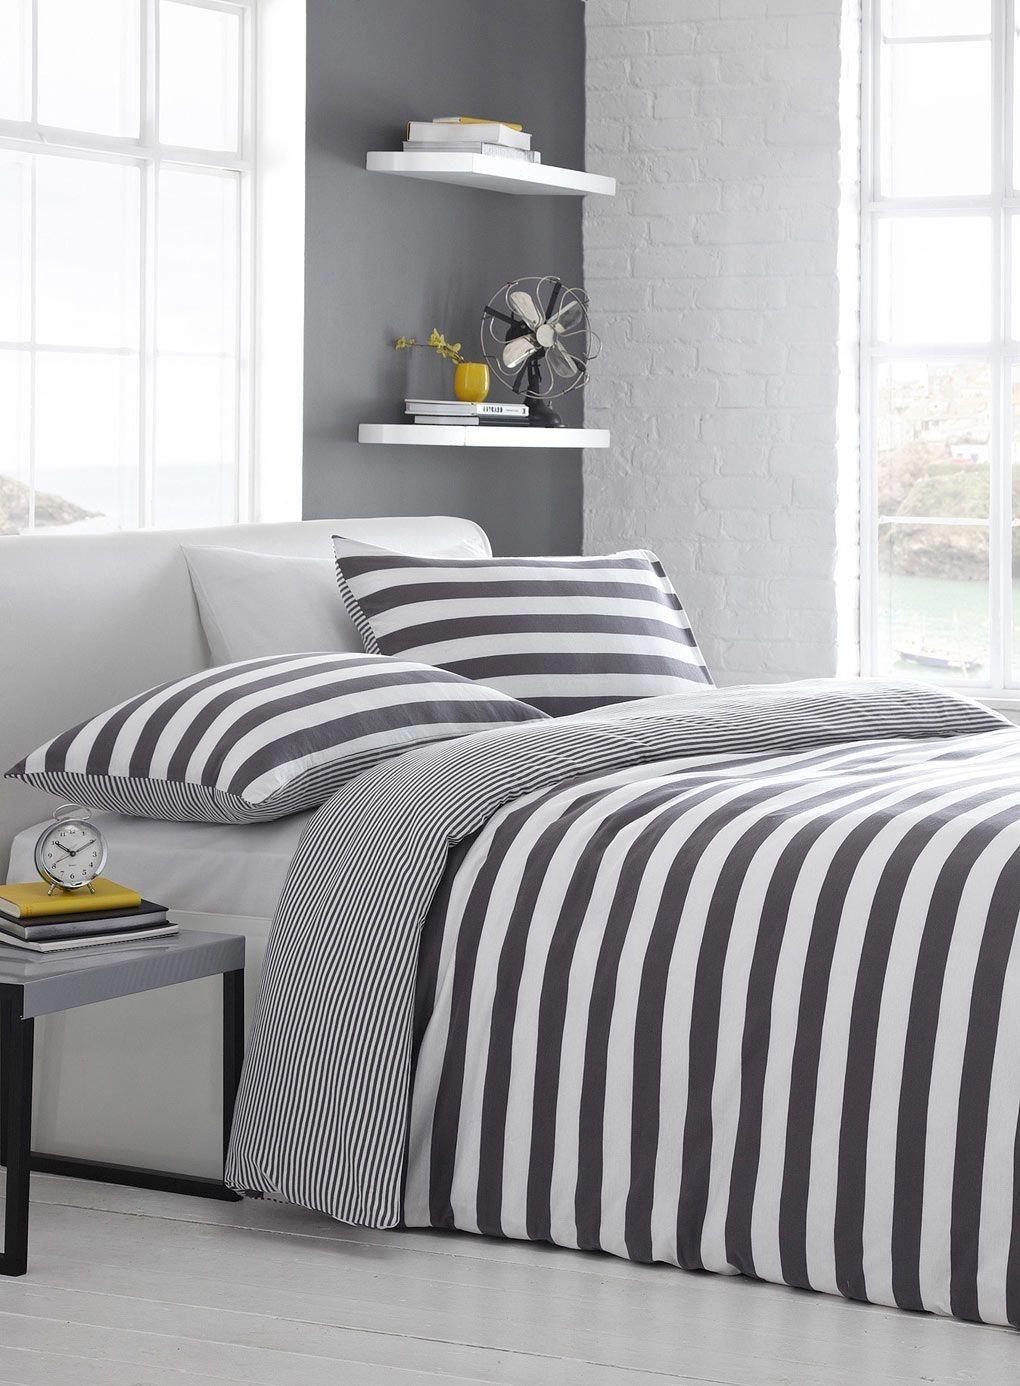 Merveilleux Black White Striped Comforter